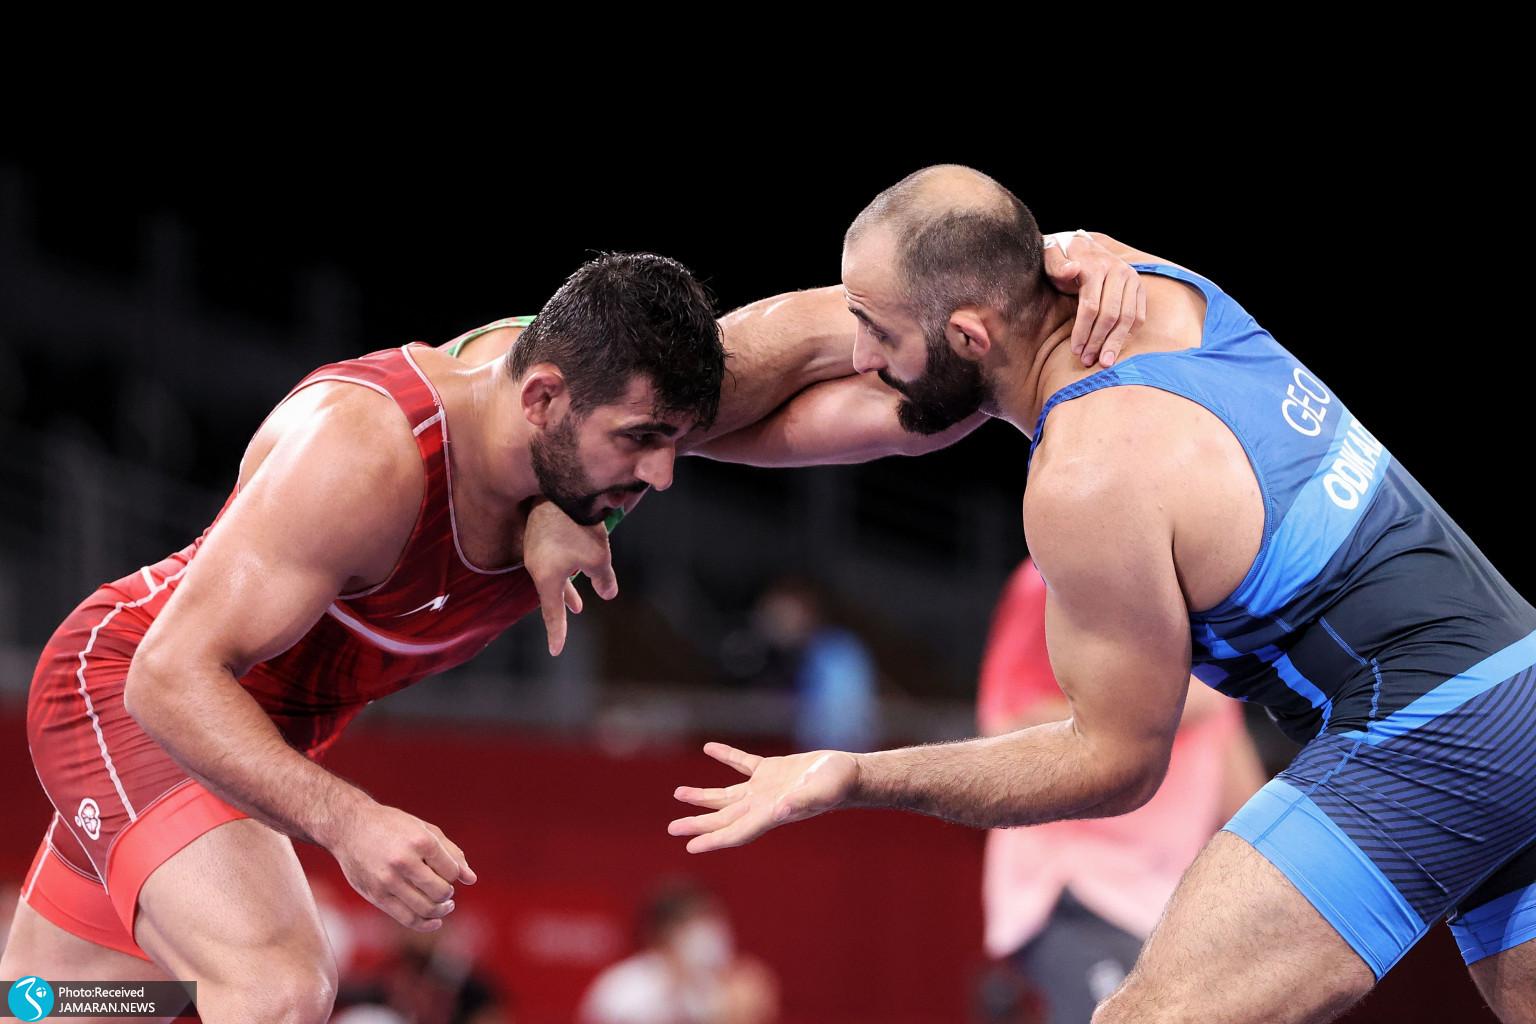 محمدحسین عسگری محمدیان در کشتی آزاد المپیک